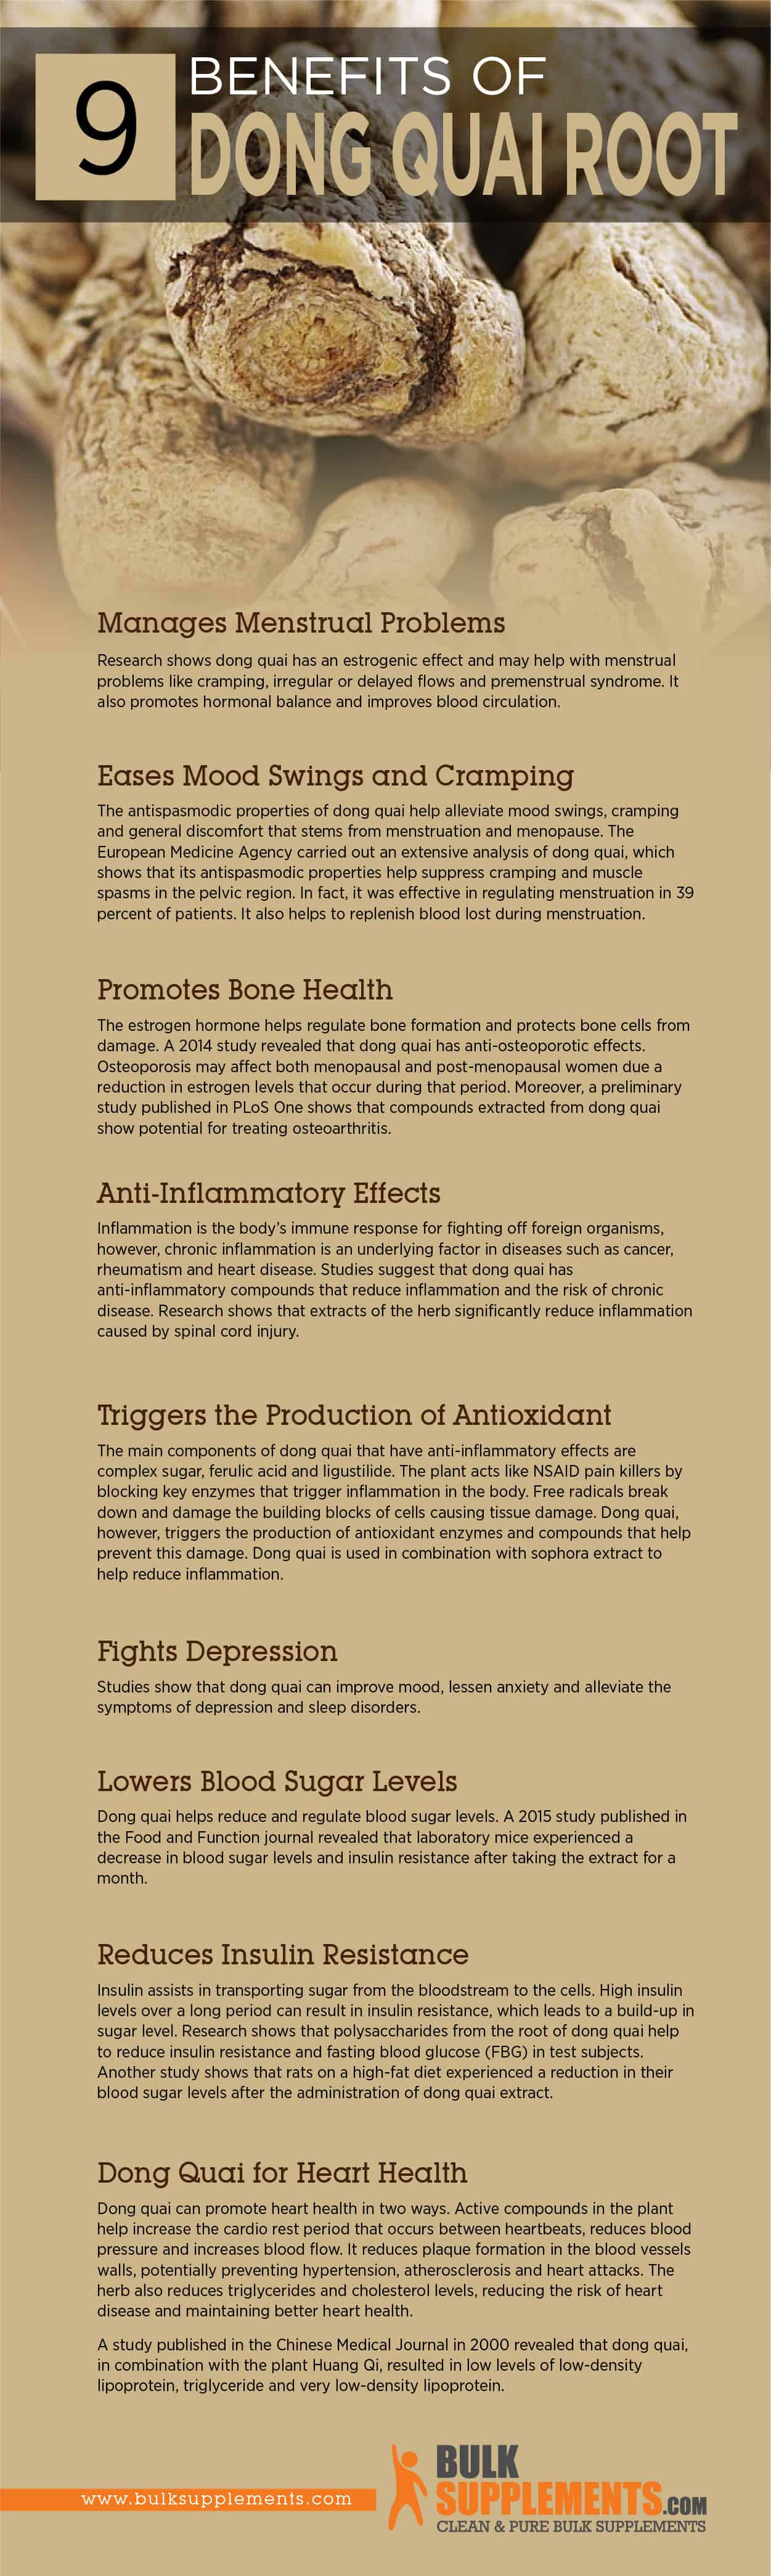 Dong Quai Extract: Benefits, Side Effects & Dosage   BulkSupplements com